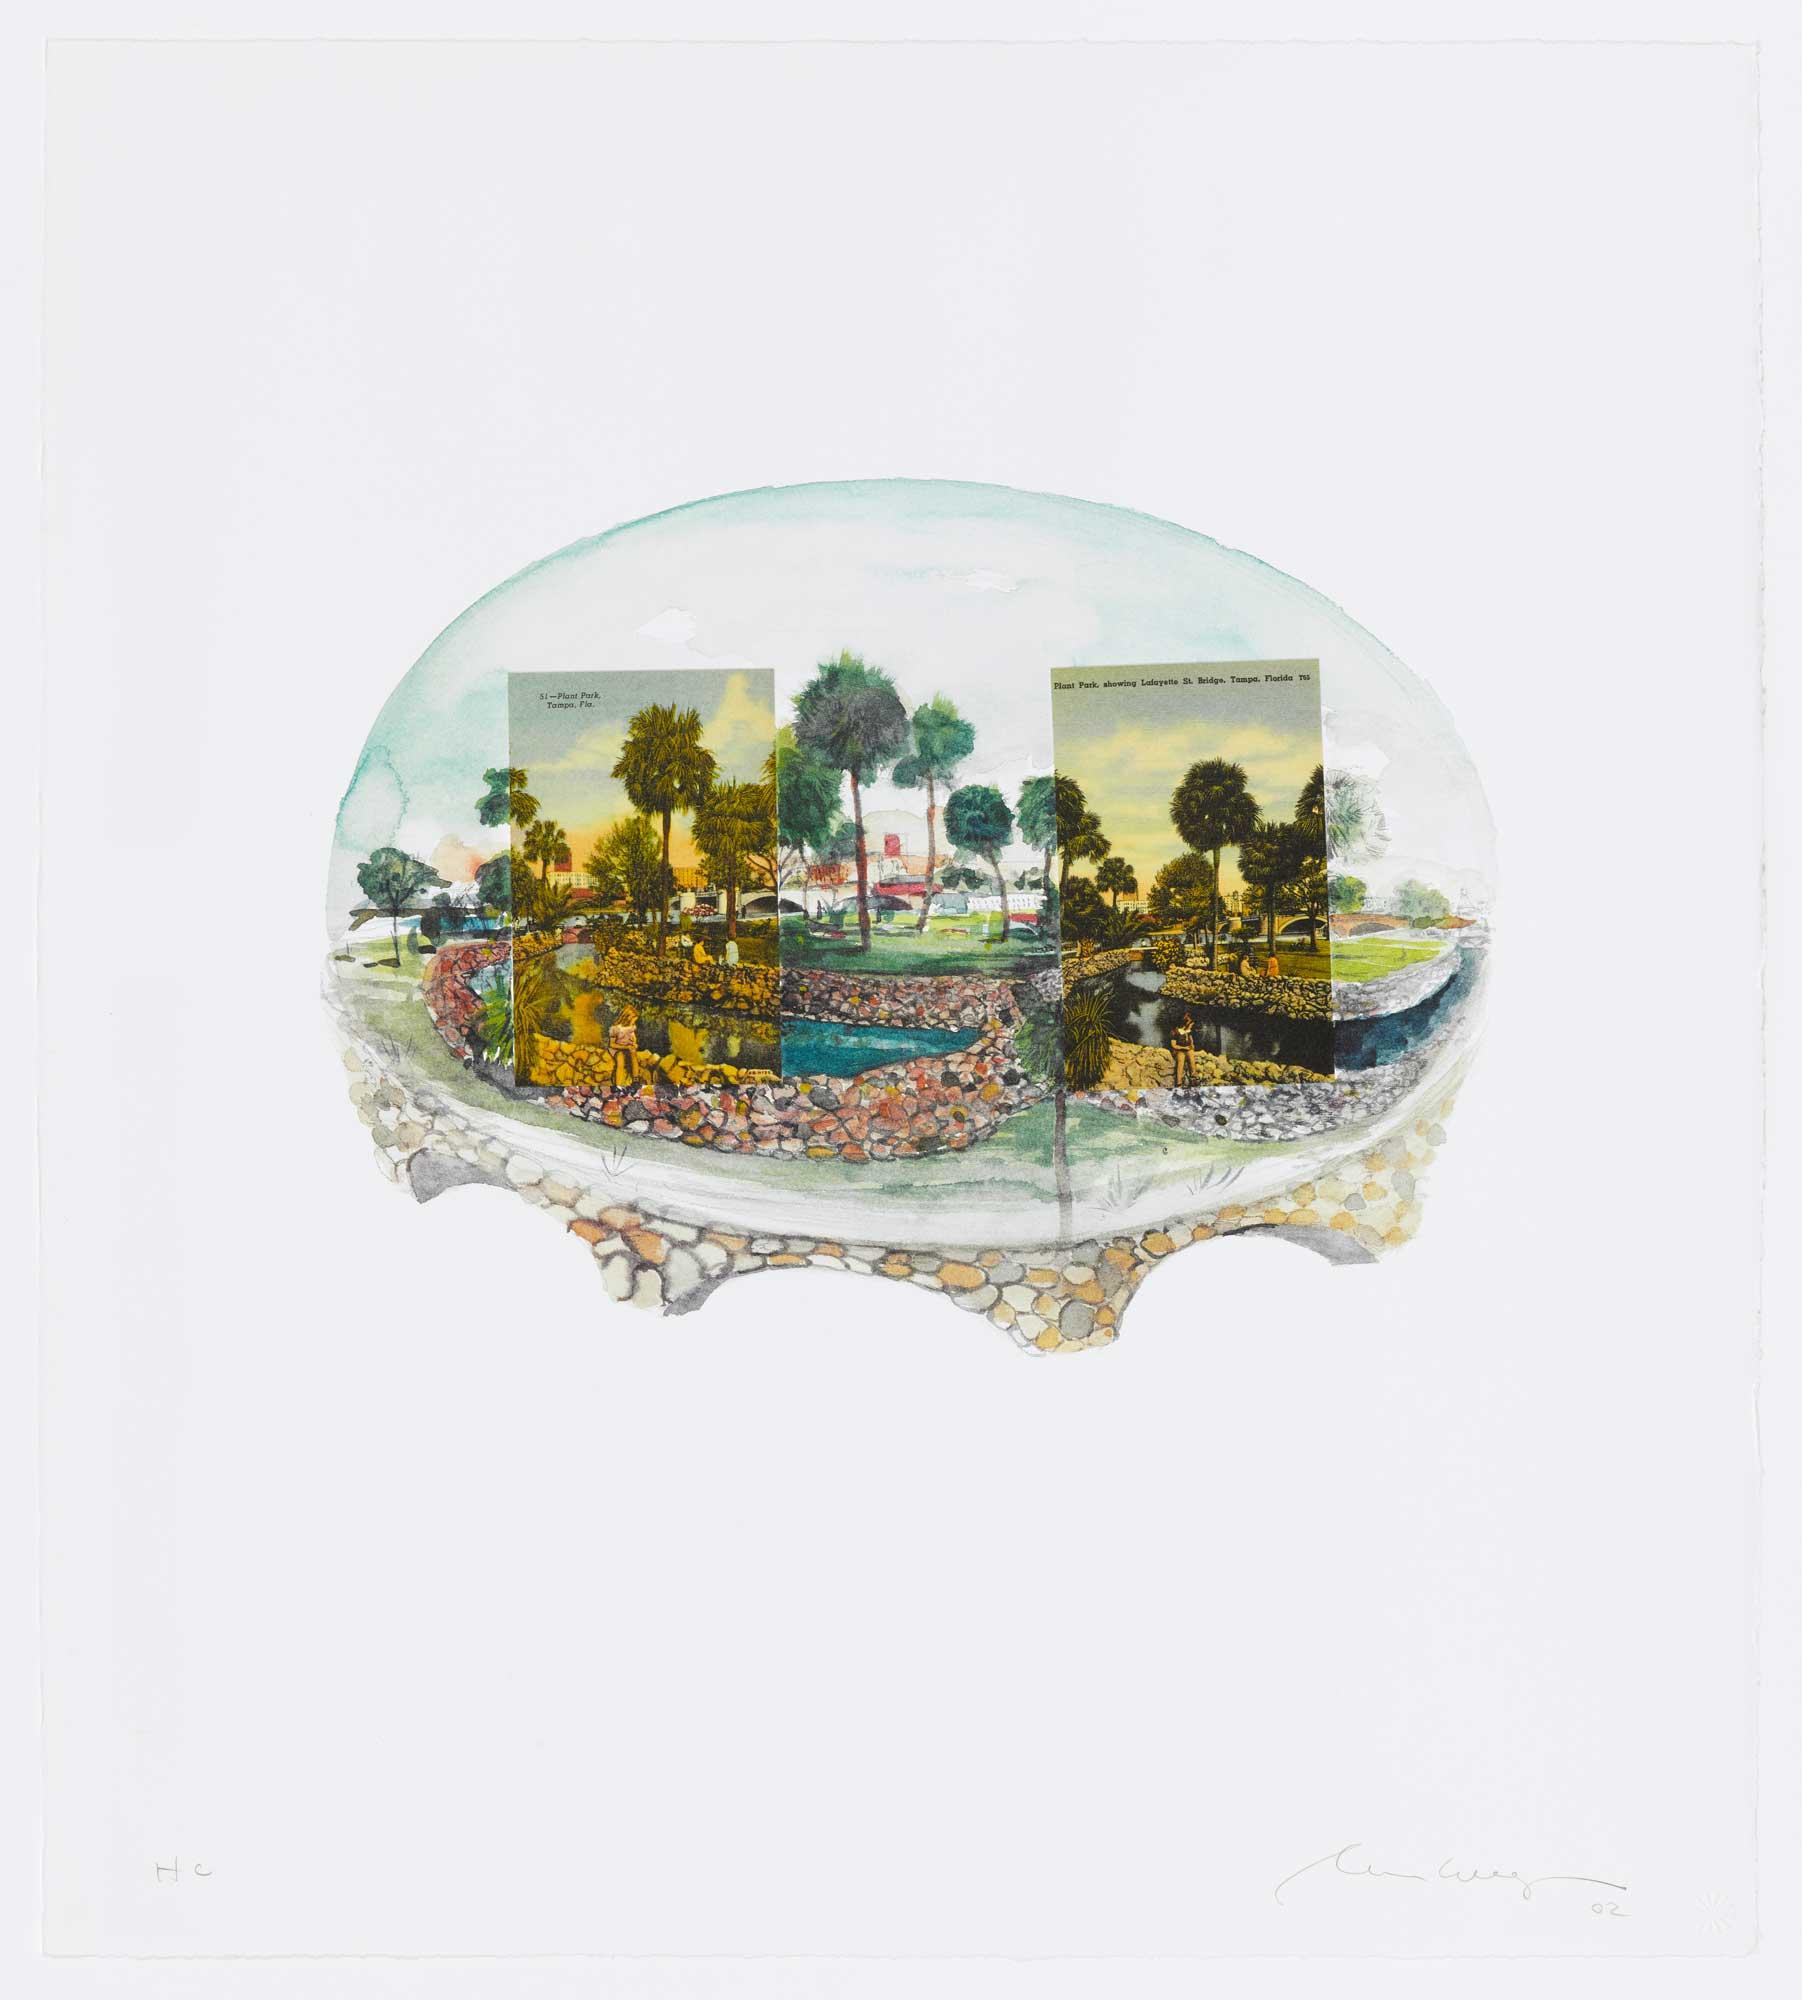 Souvenir by William Wegman